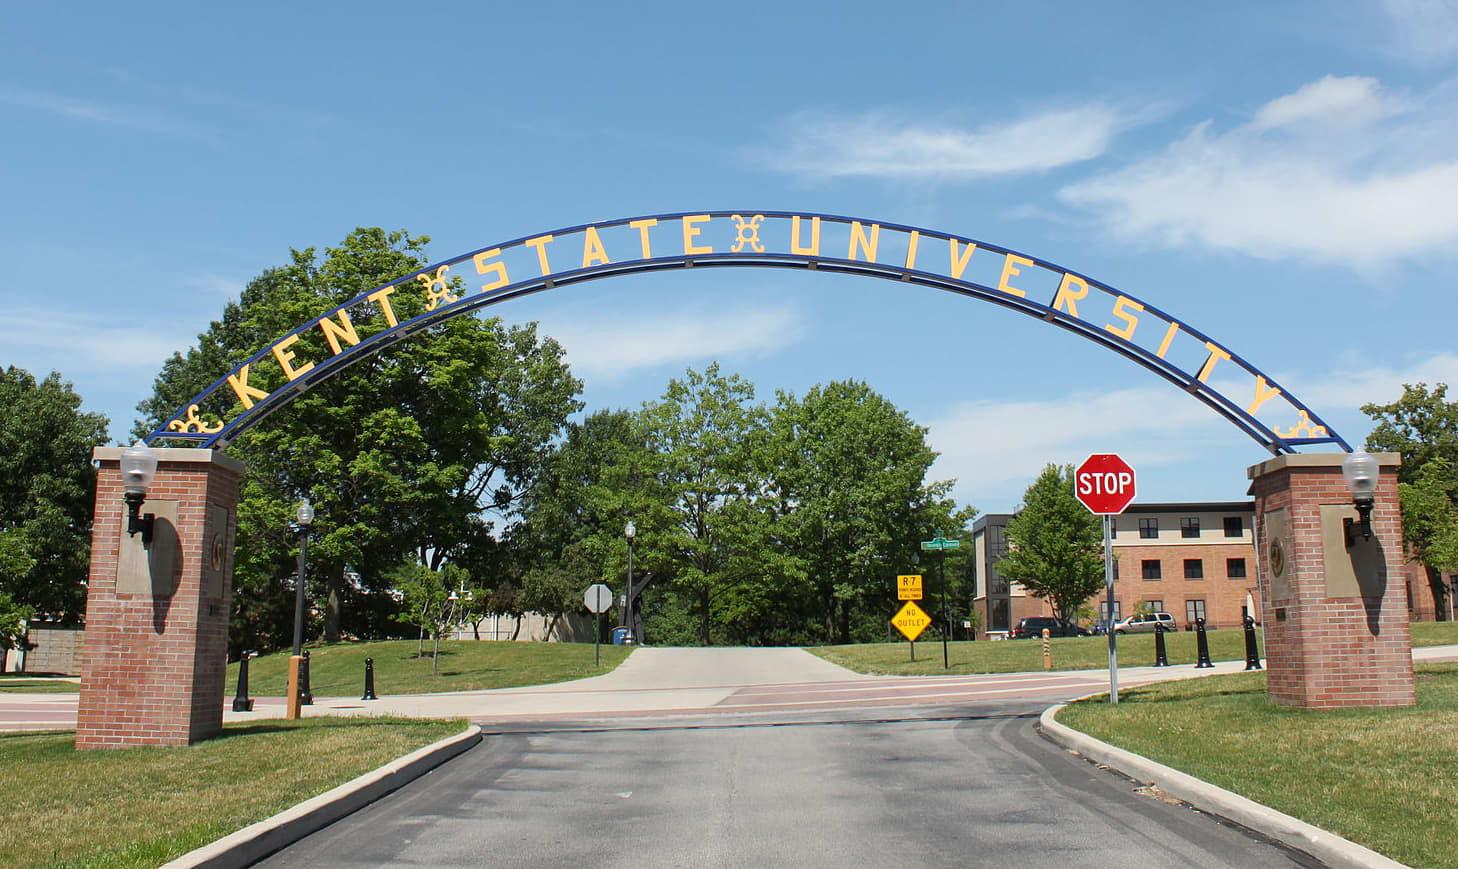 CC: Kent State University